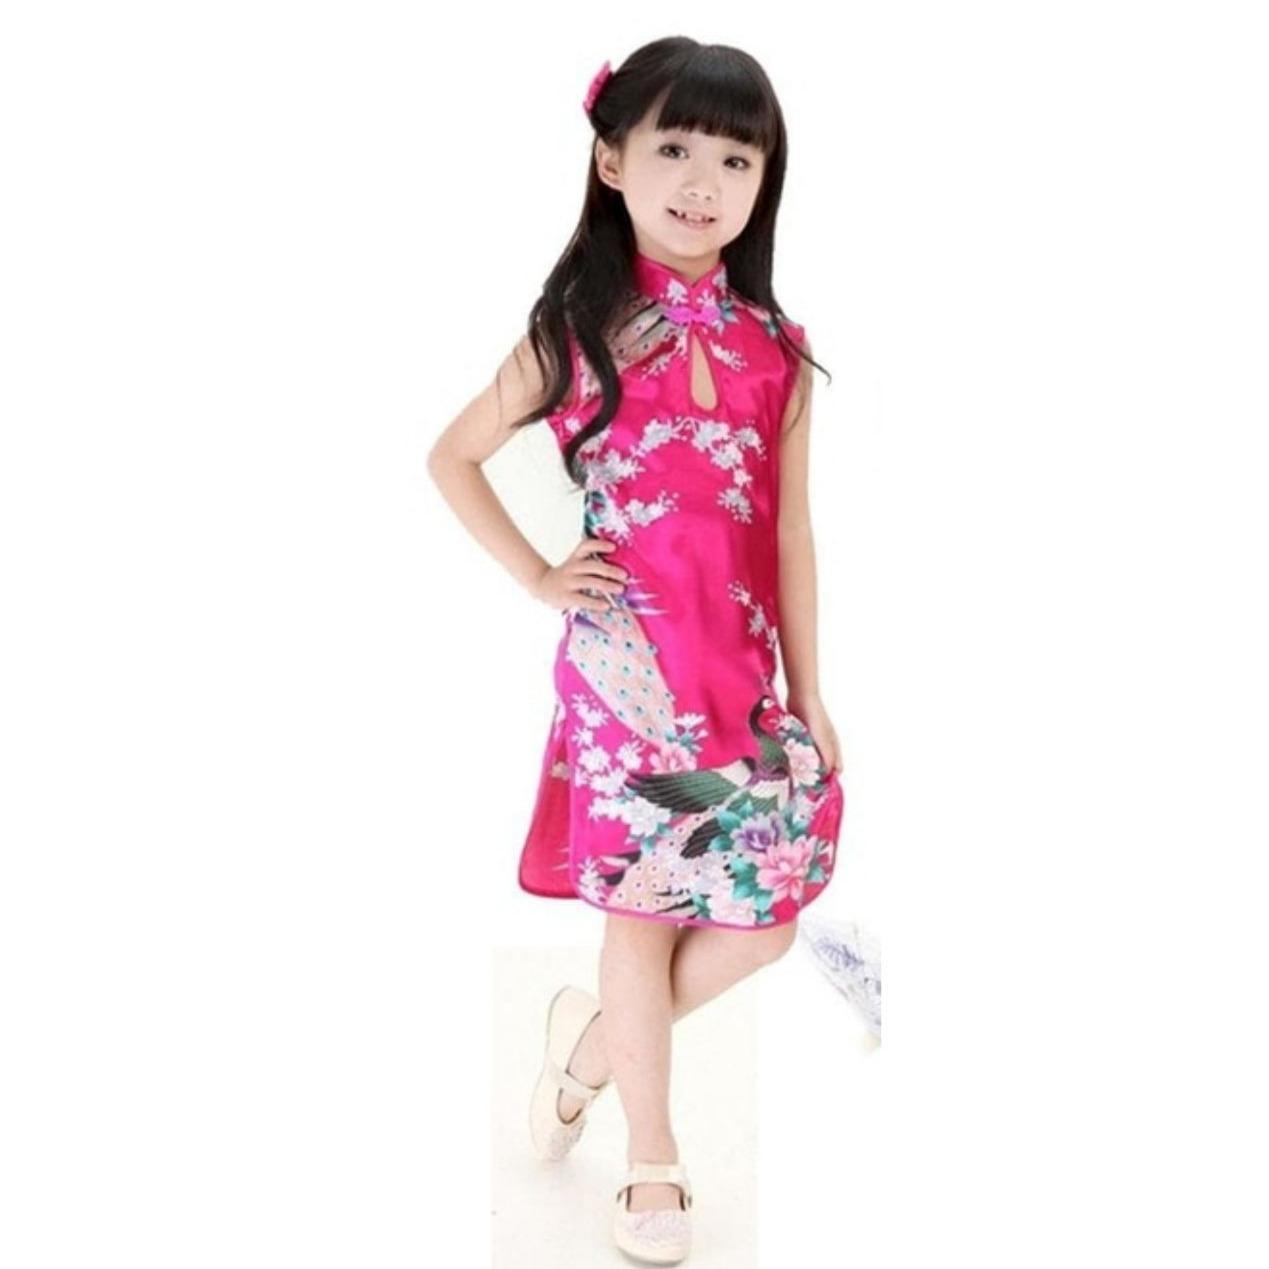 Celine's - Baju Cheongsam Anak Perempuan Import [Pink]